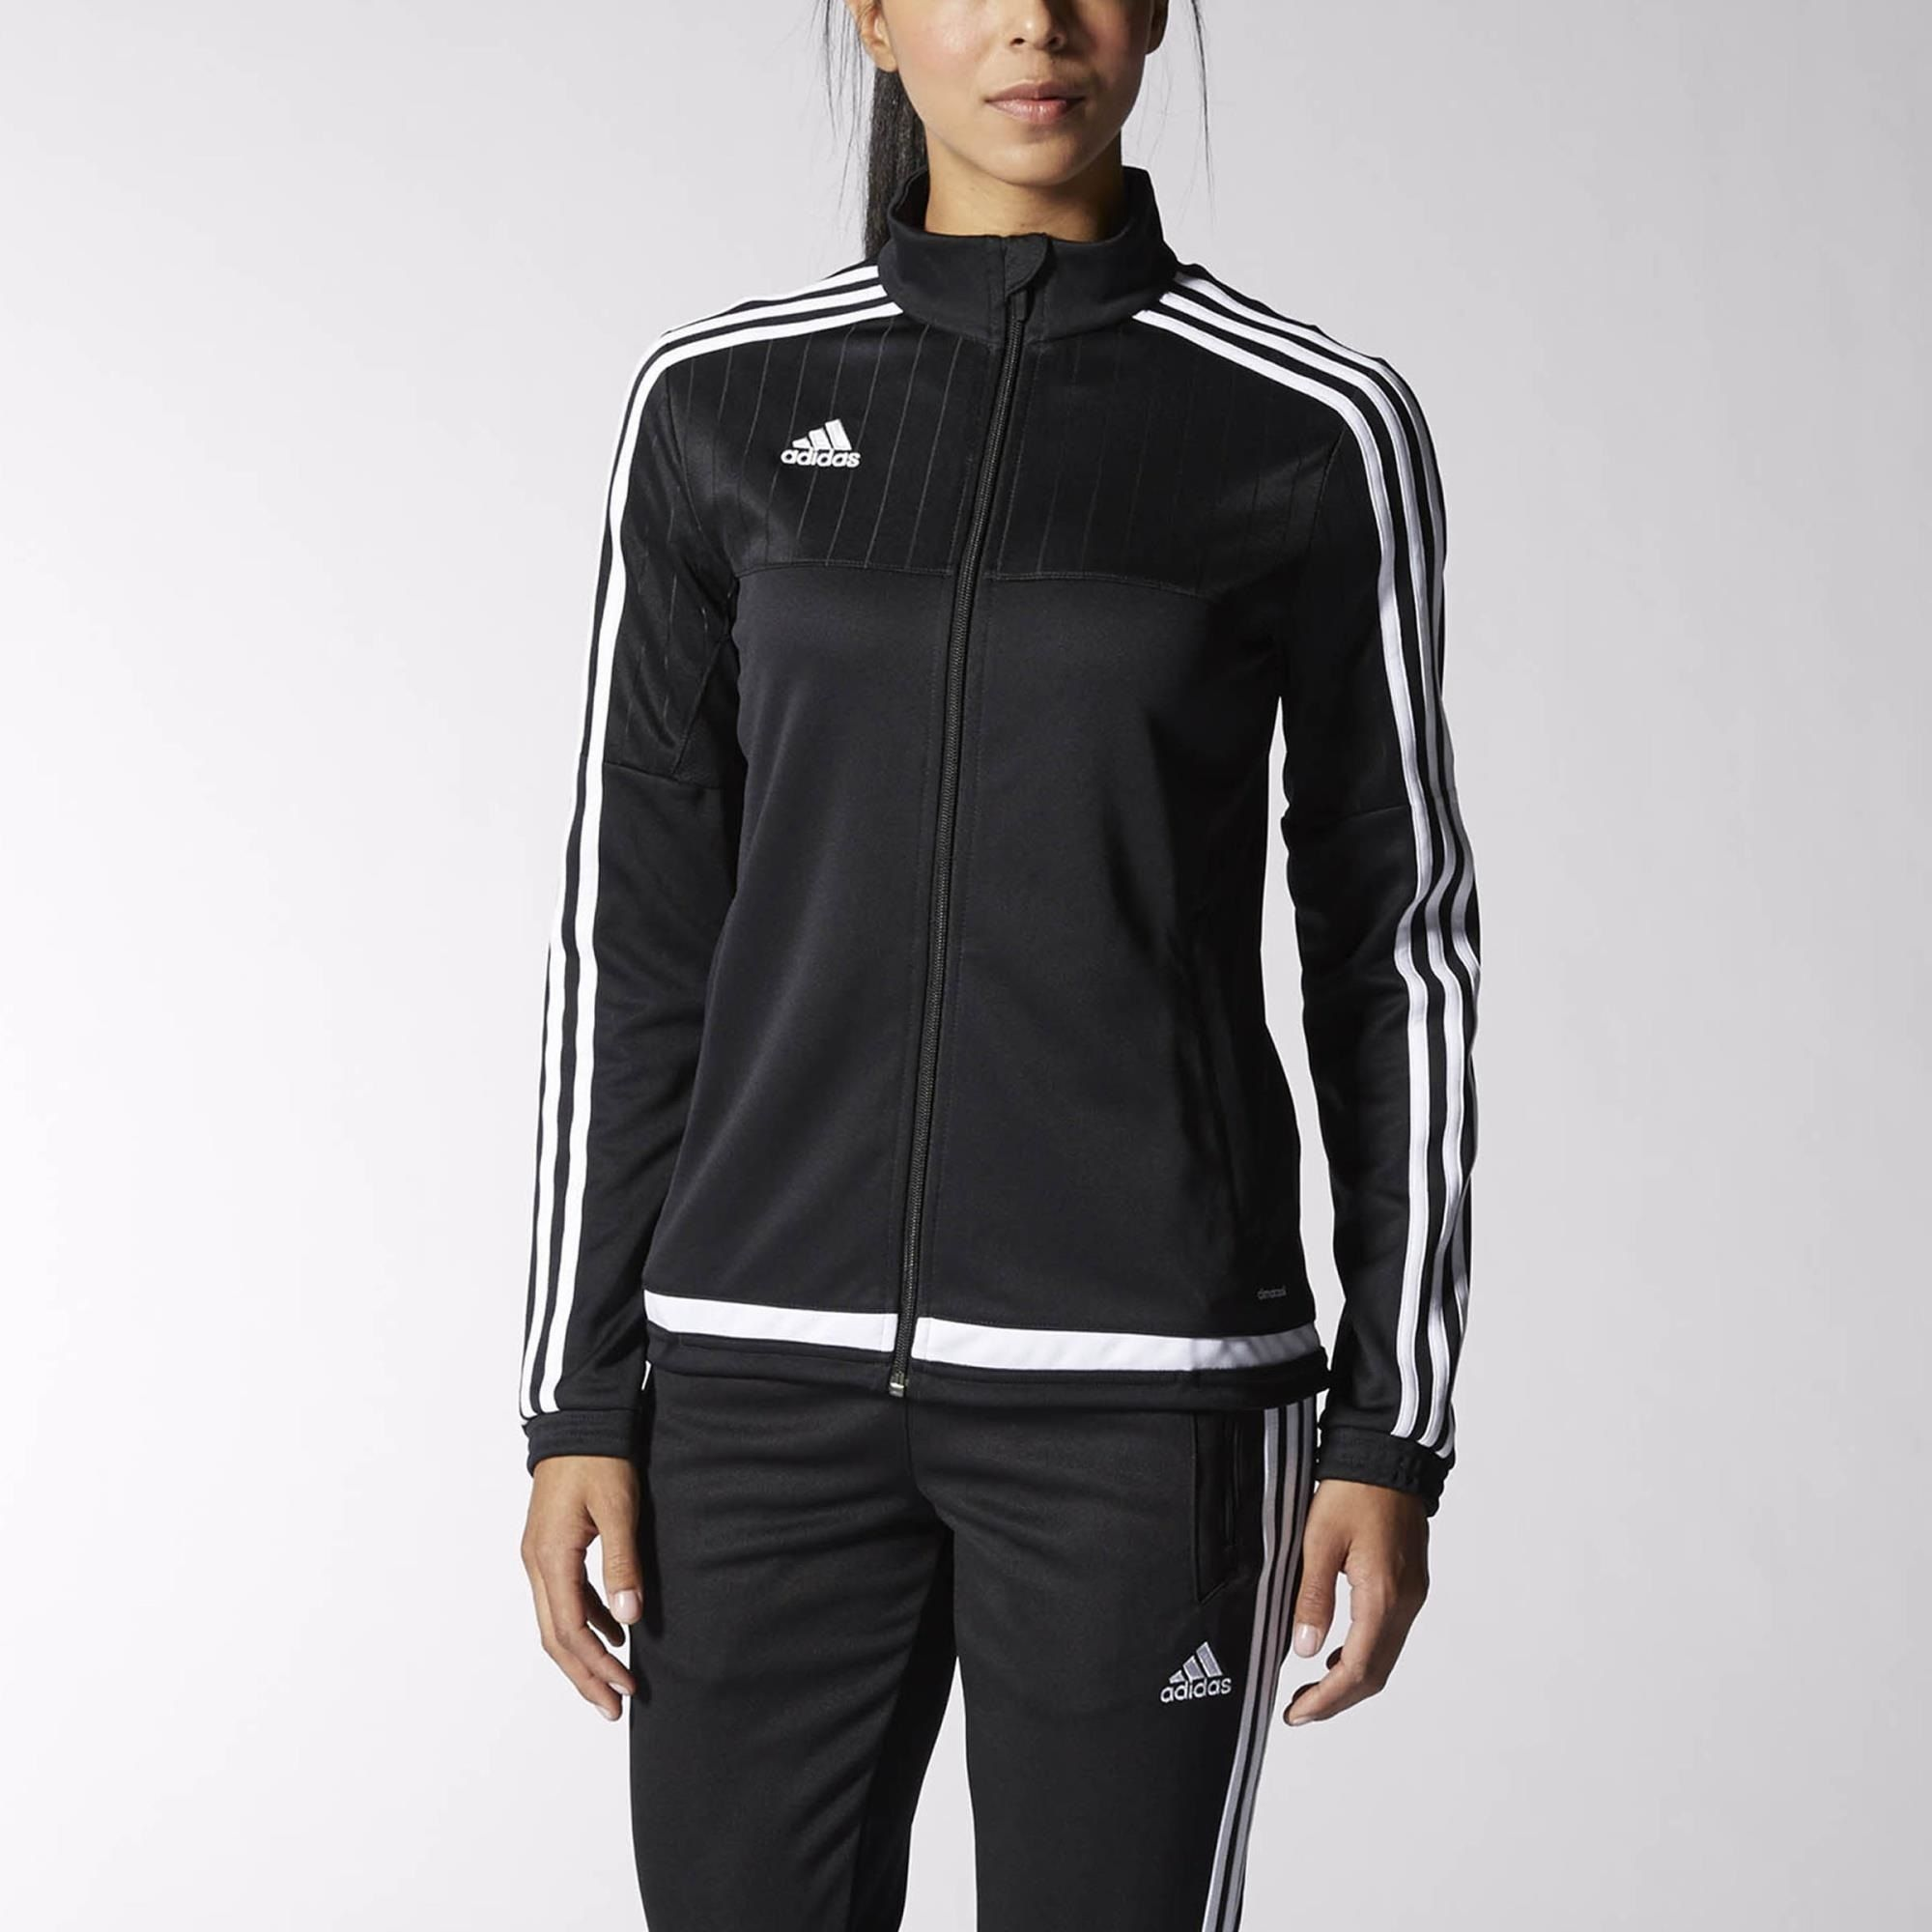 Back Soon Stronger Than Ever Jackets Adidas Women Fashion [ 2000 x 2000 Pixel ]